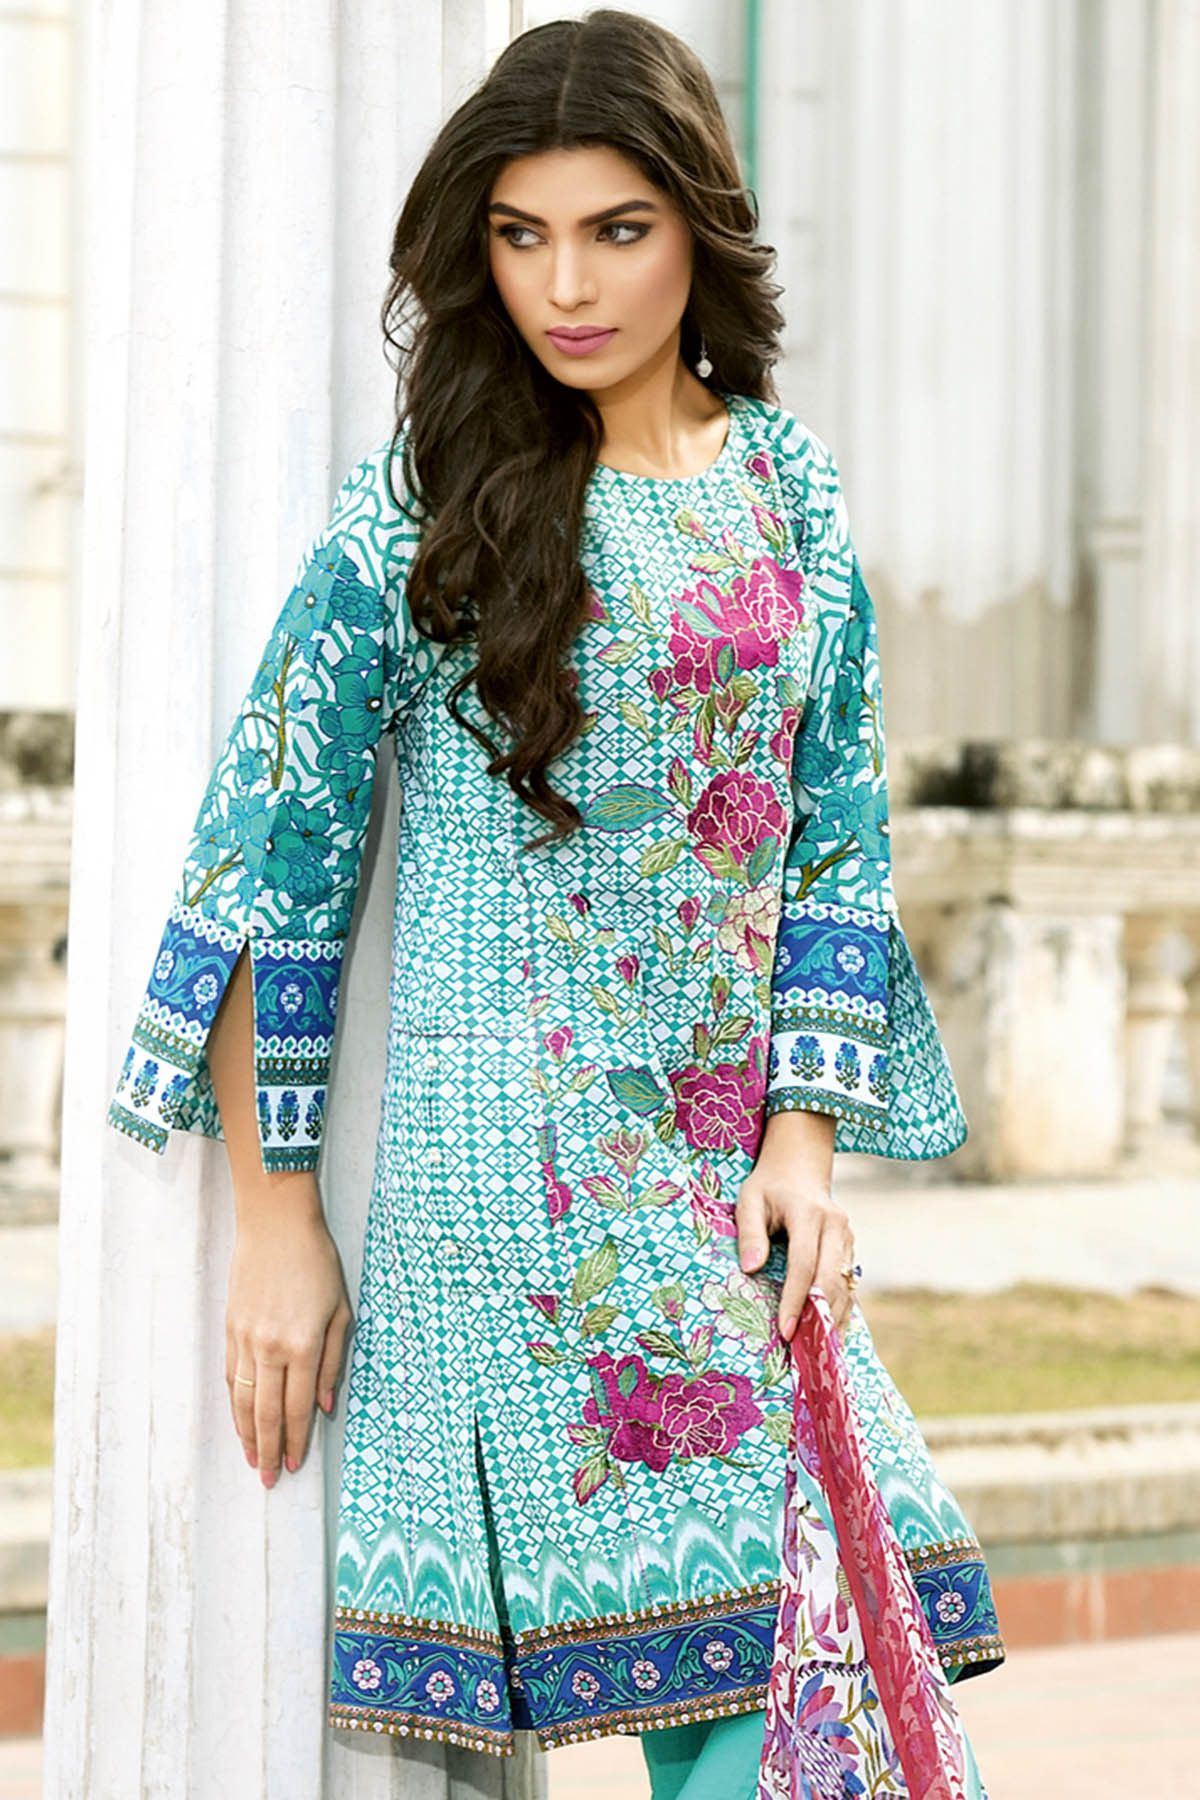 Summer beautiful dresses gul ahmad